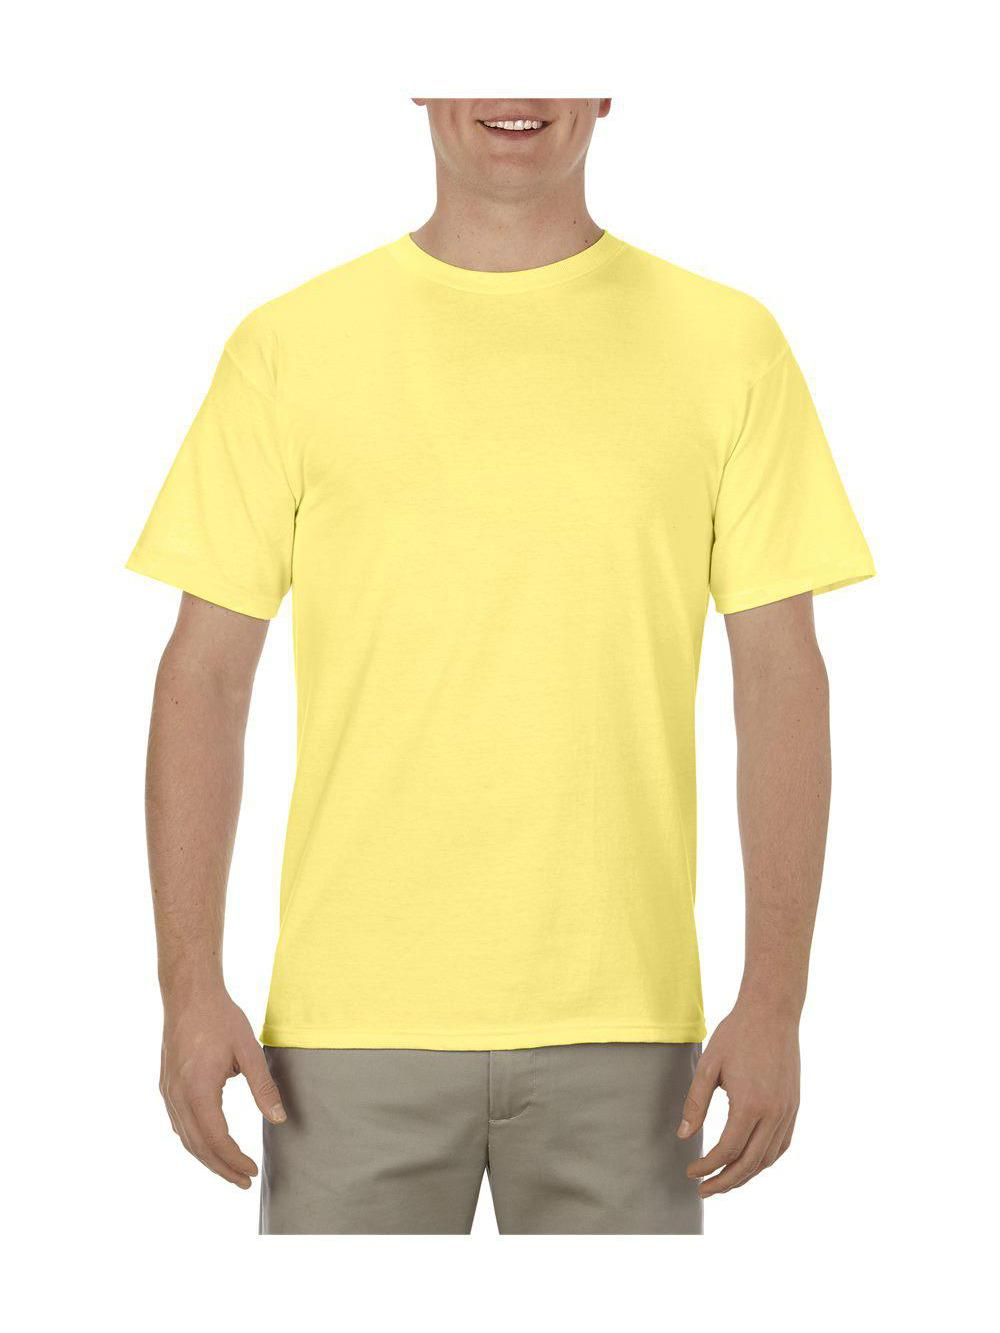 ALSTYLE-Premium-T-Shirt-1701 thumbnail 6